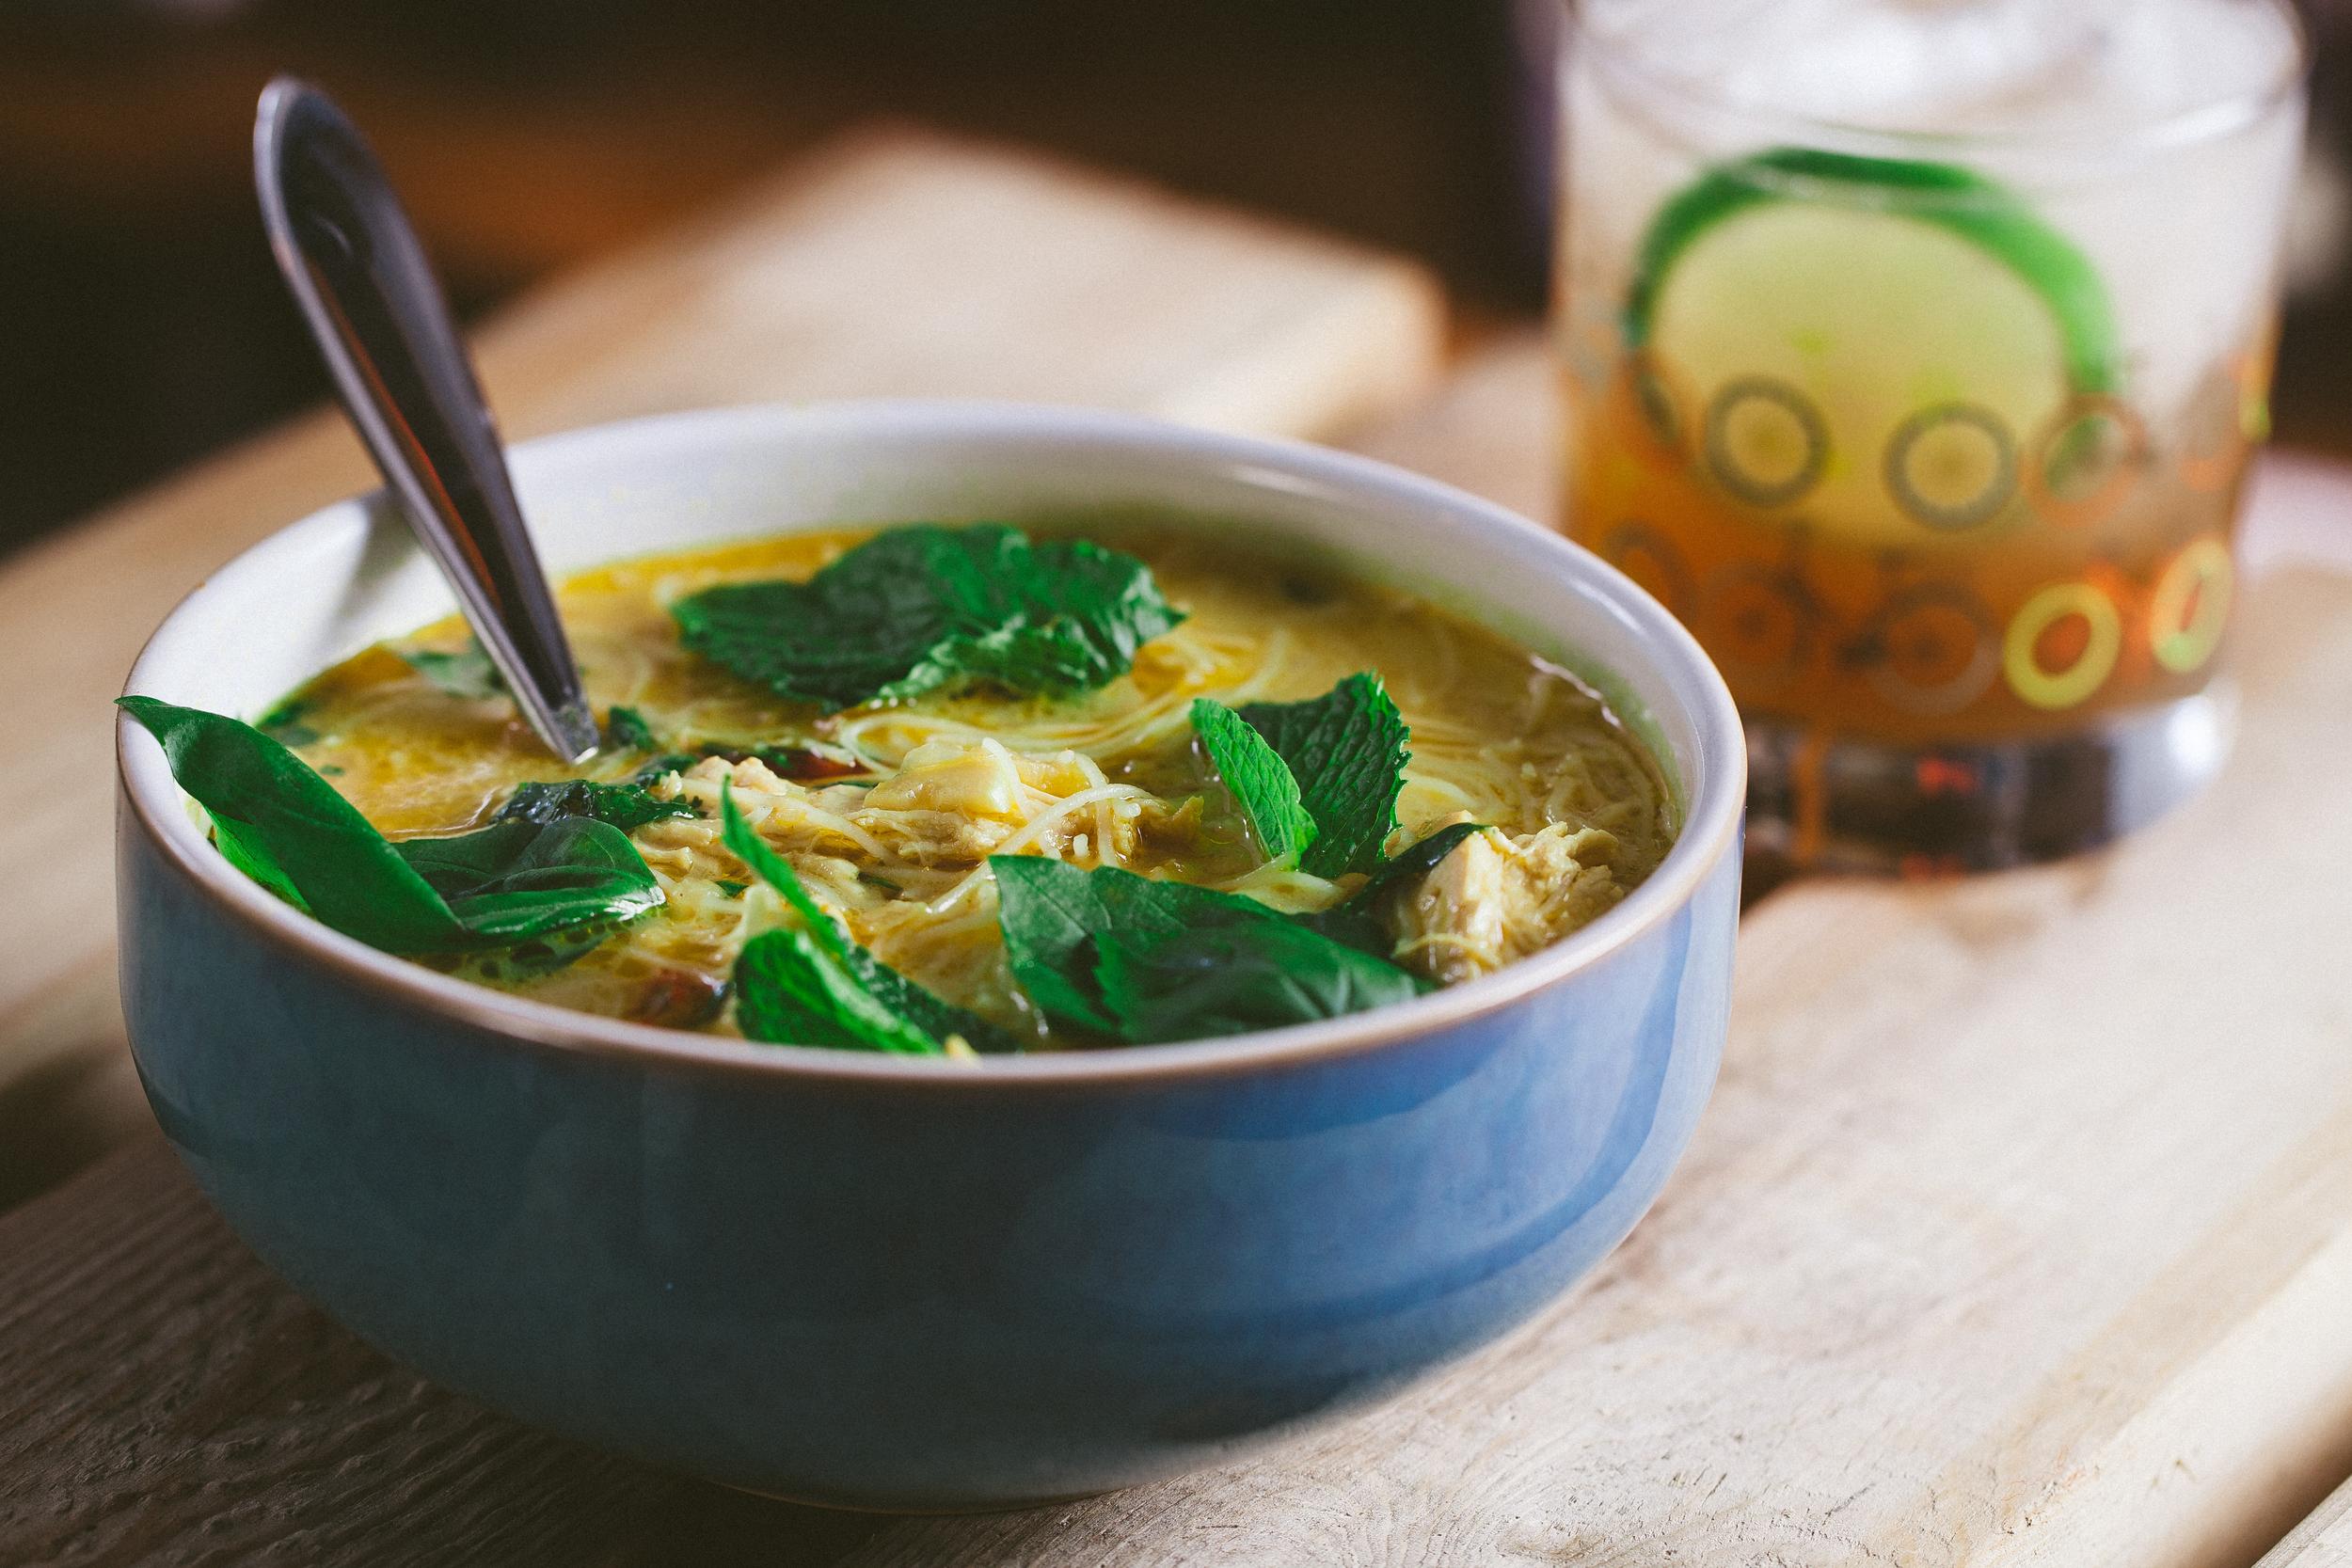 Spicy Vietnamese chicken noodle soup